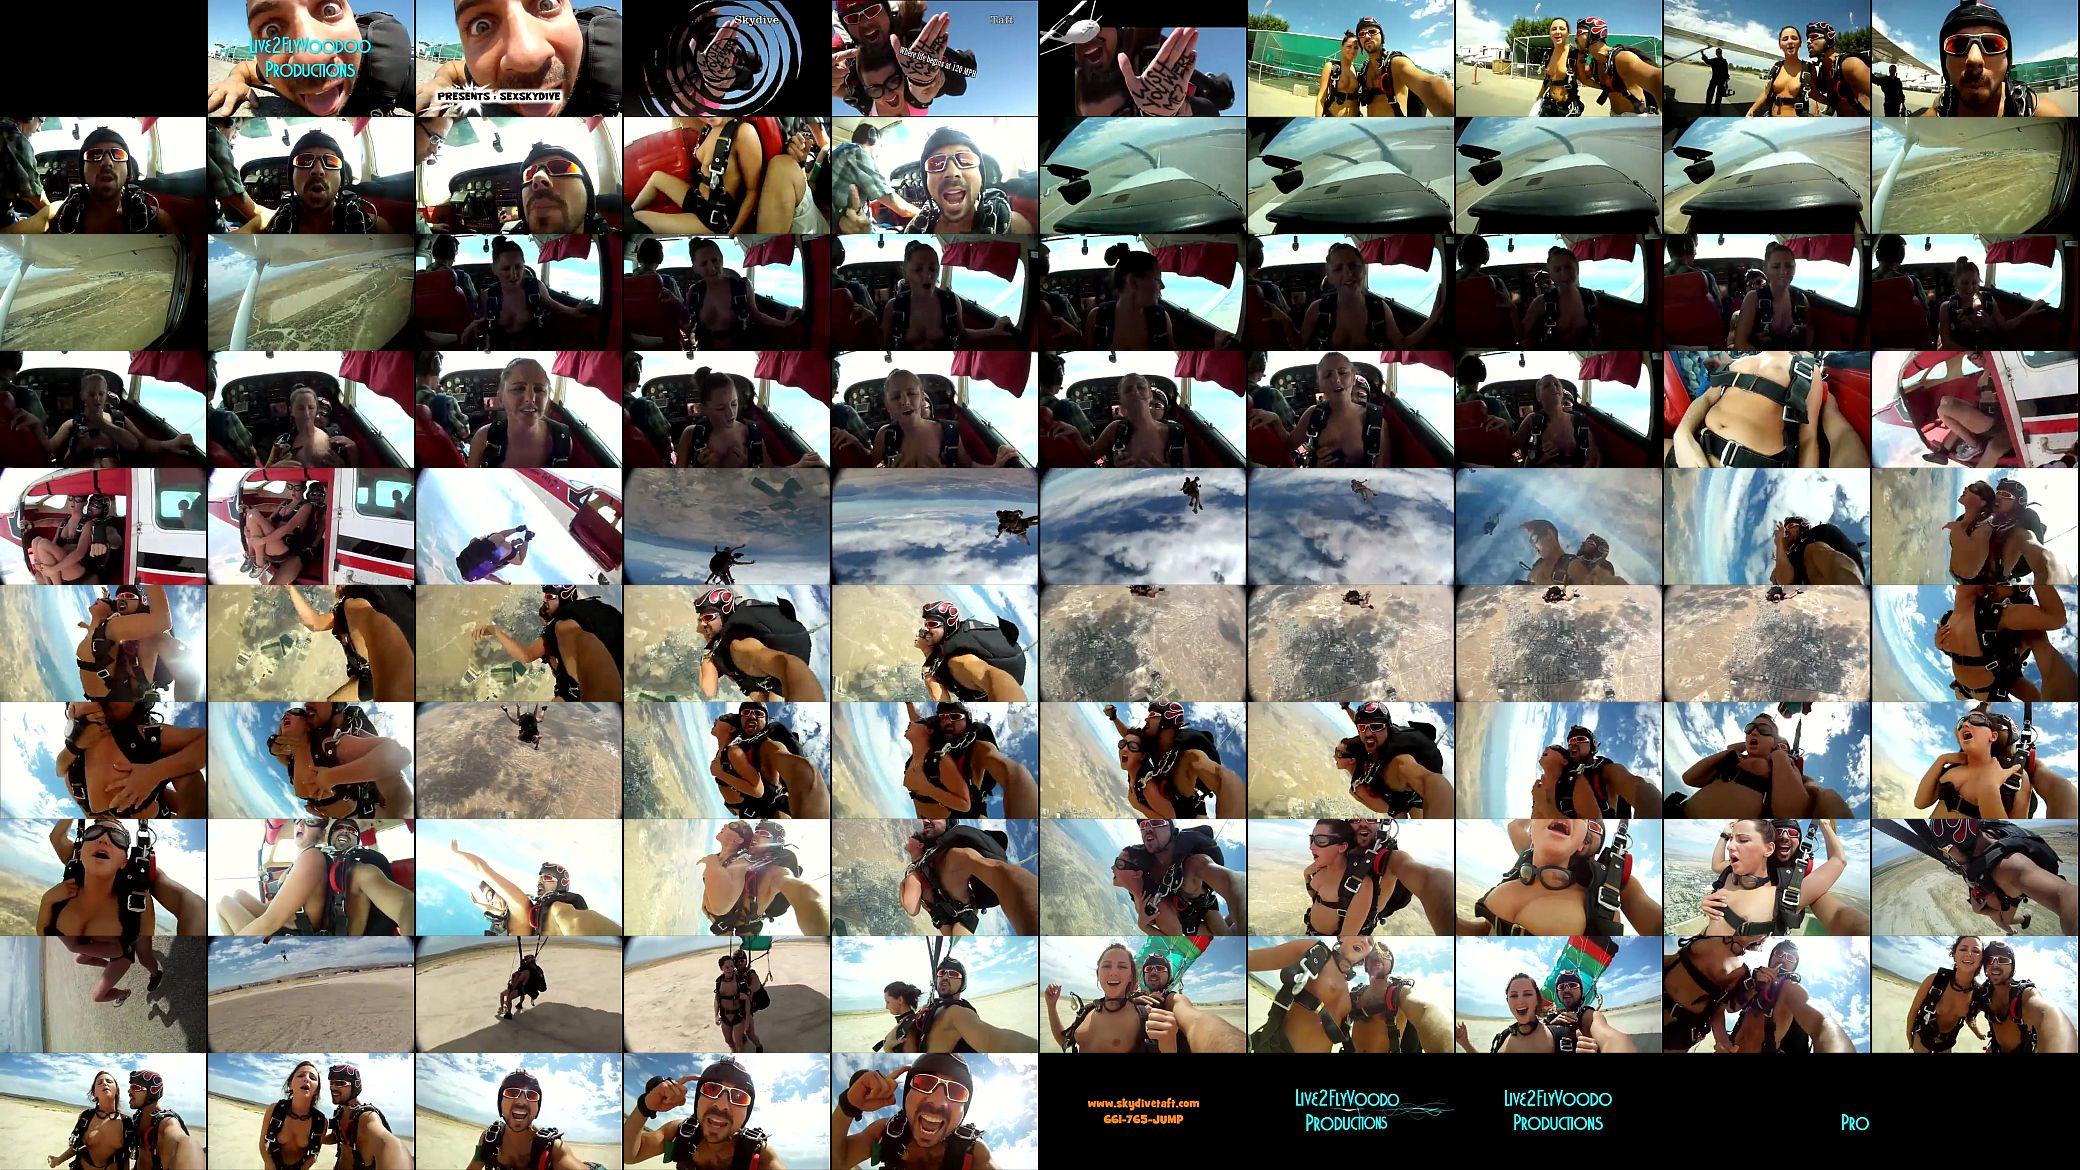 Skydive Fuck Mobile Porno Videos Movies